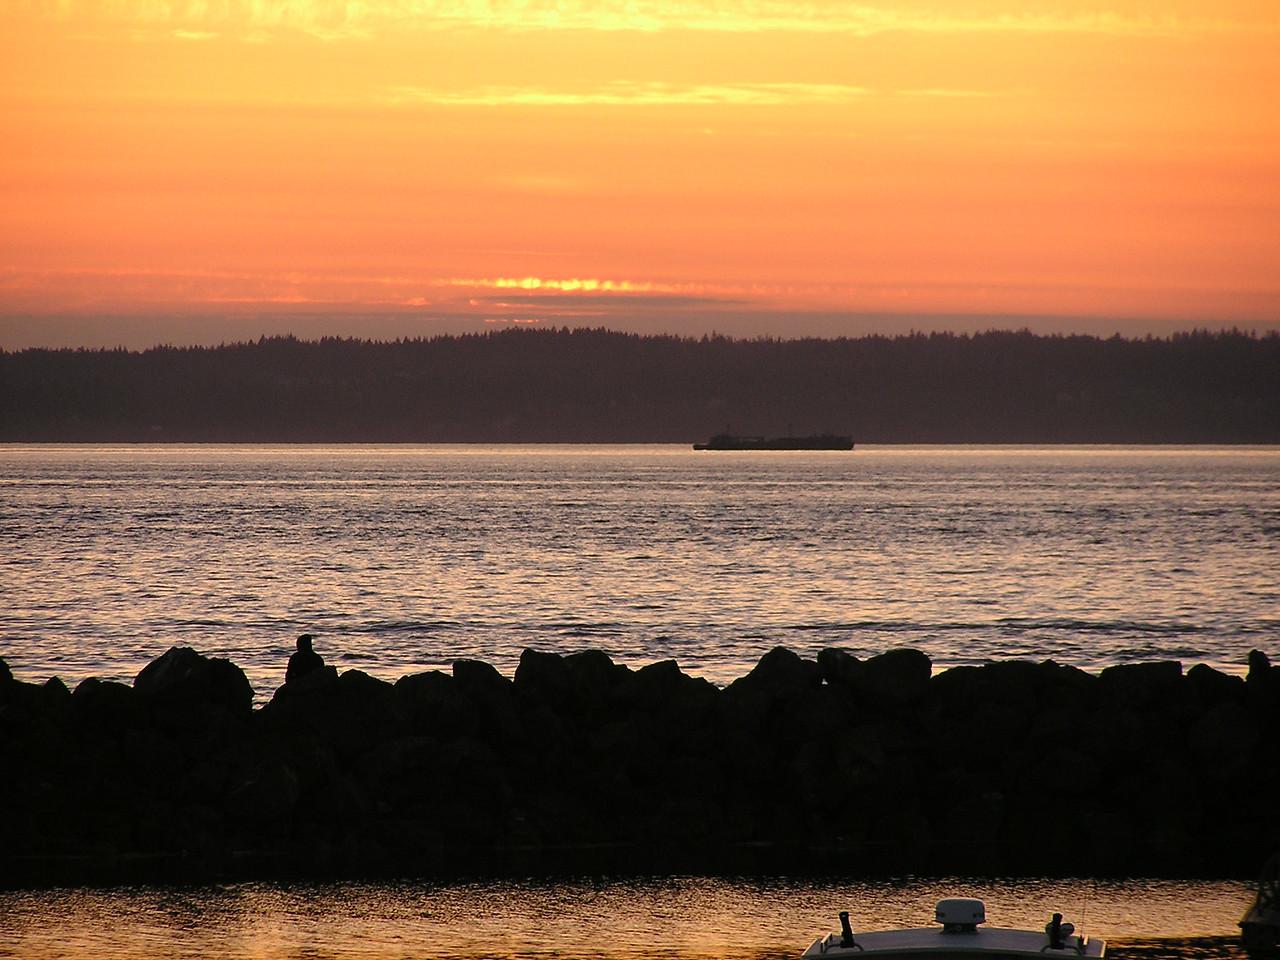 07 06 20 Sunset 016